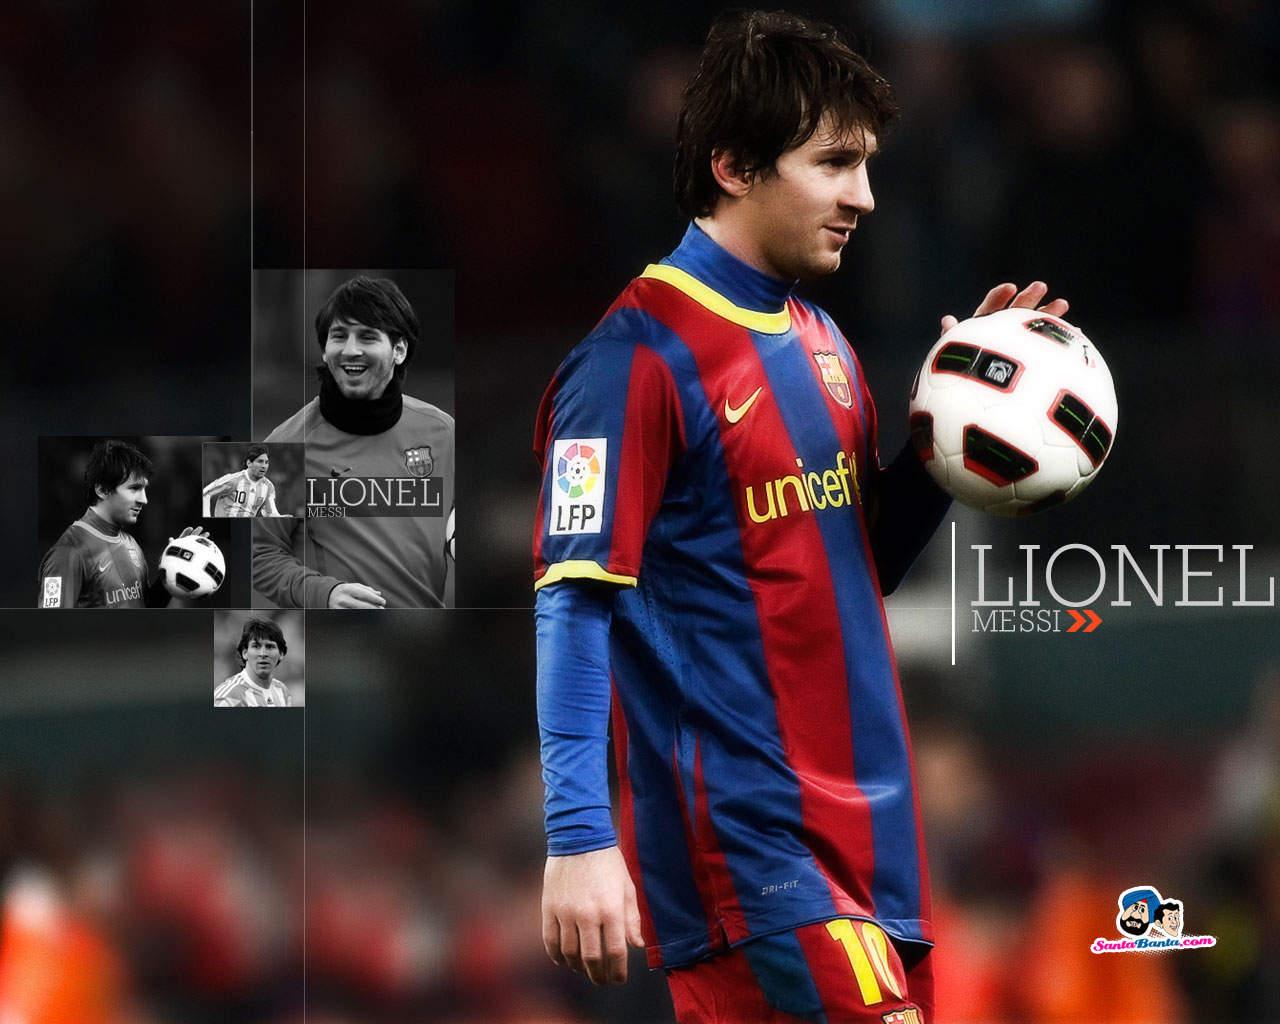 http://1.bp.blogspot.com/-4Swt-S7dfdk/ULk_QUW2mqI/AAAAAAAAACk/hVBWVB5_vNw/s1600/Lionel+Messi+Wallpapers+2.jpg